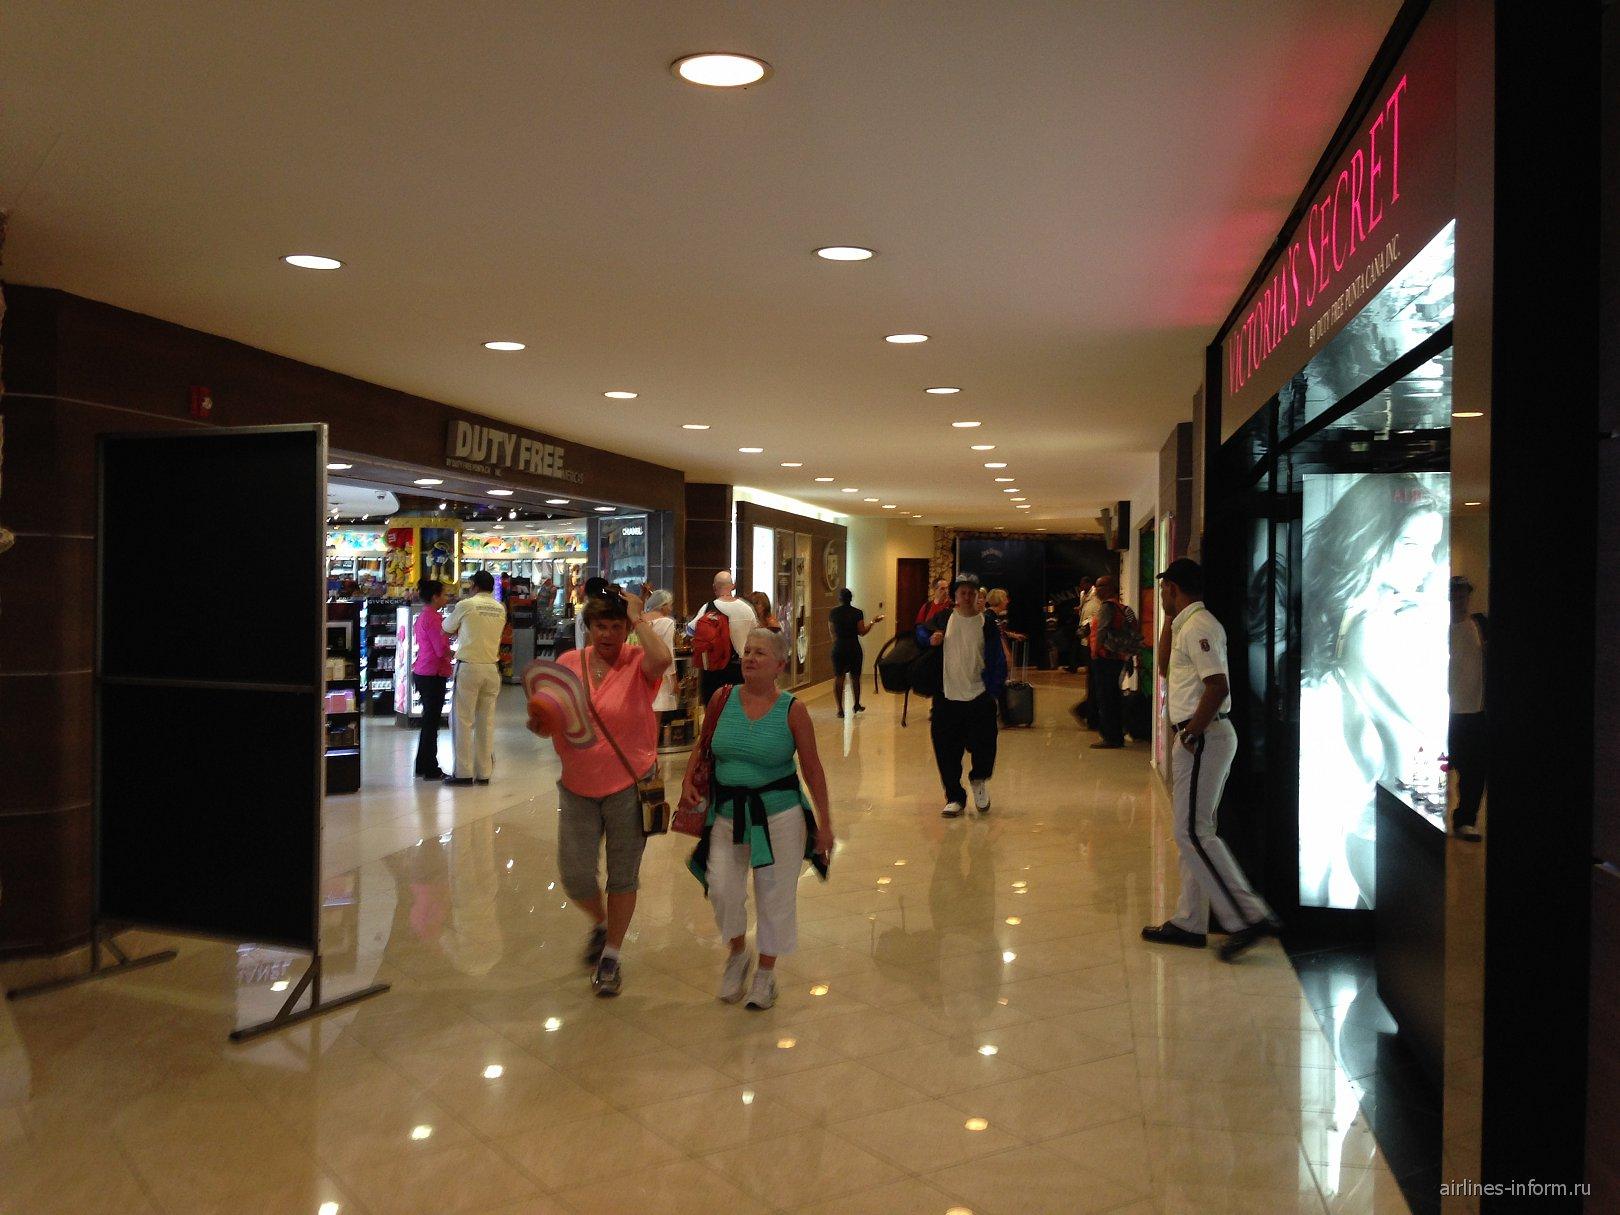 Магазины Duty-Free в аэропорту Пунта-Кана